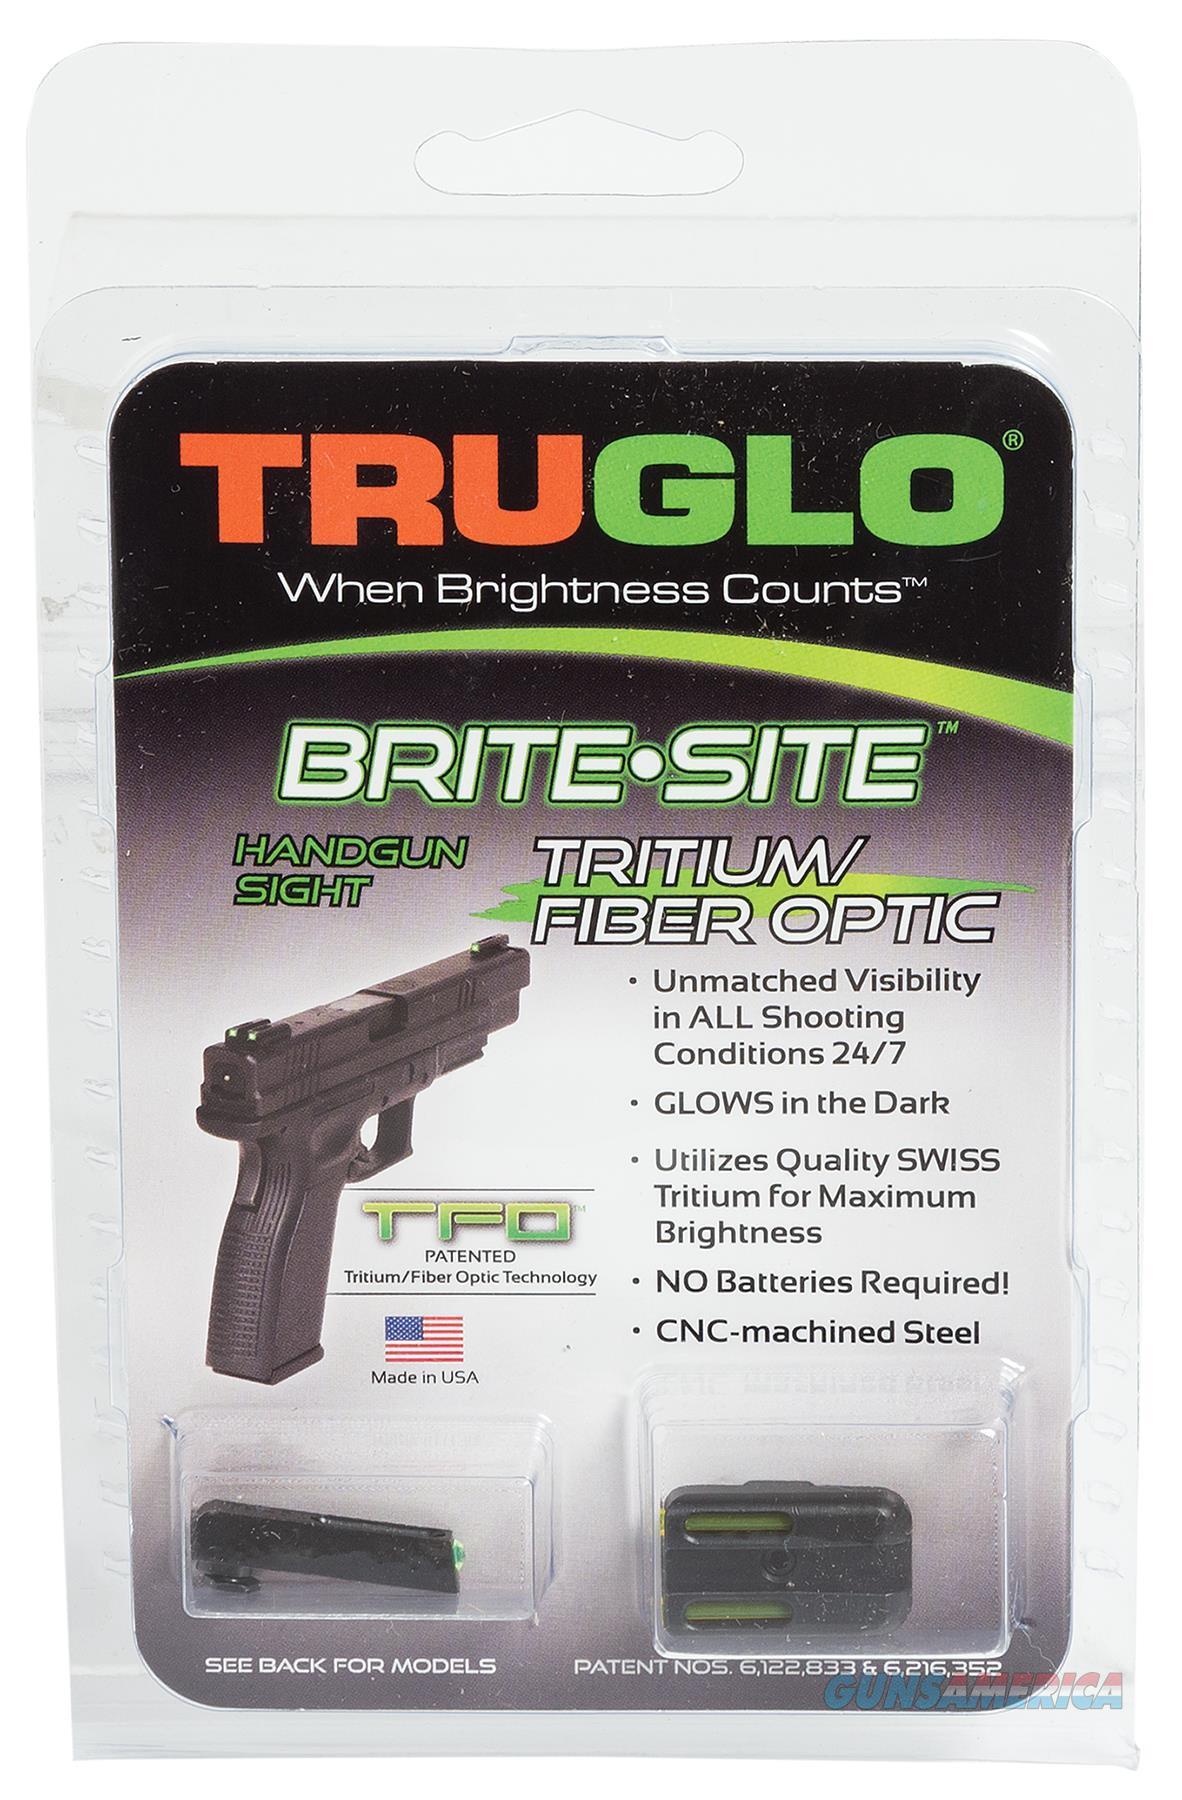 Truglo Tg131gt1b Brite-Site Tfo Glock 42/43 Tritium/Fiber Optic Green Front Yellow Rear Black TG131GT1B  Non-Guns > Iron/Metal/Peep Sights